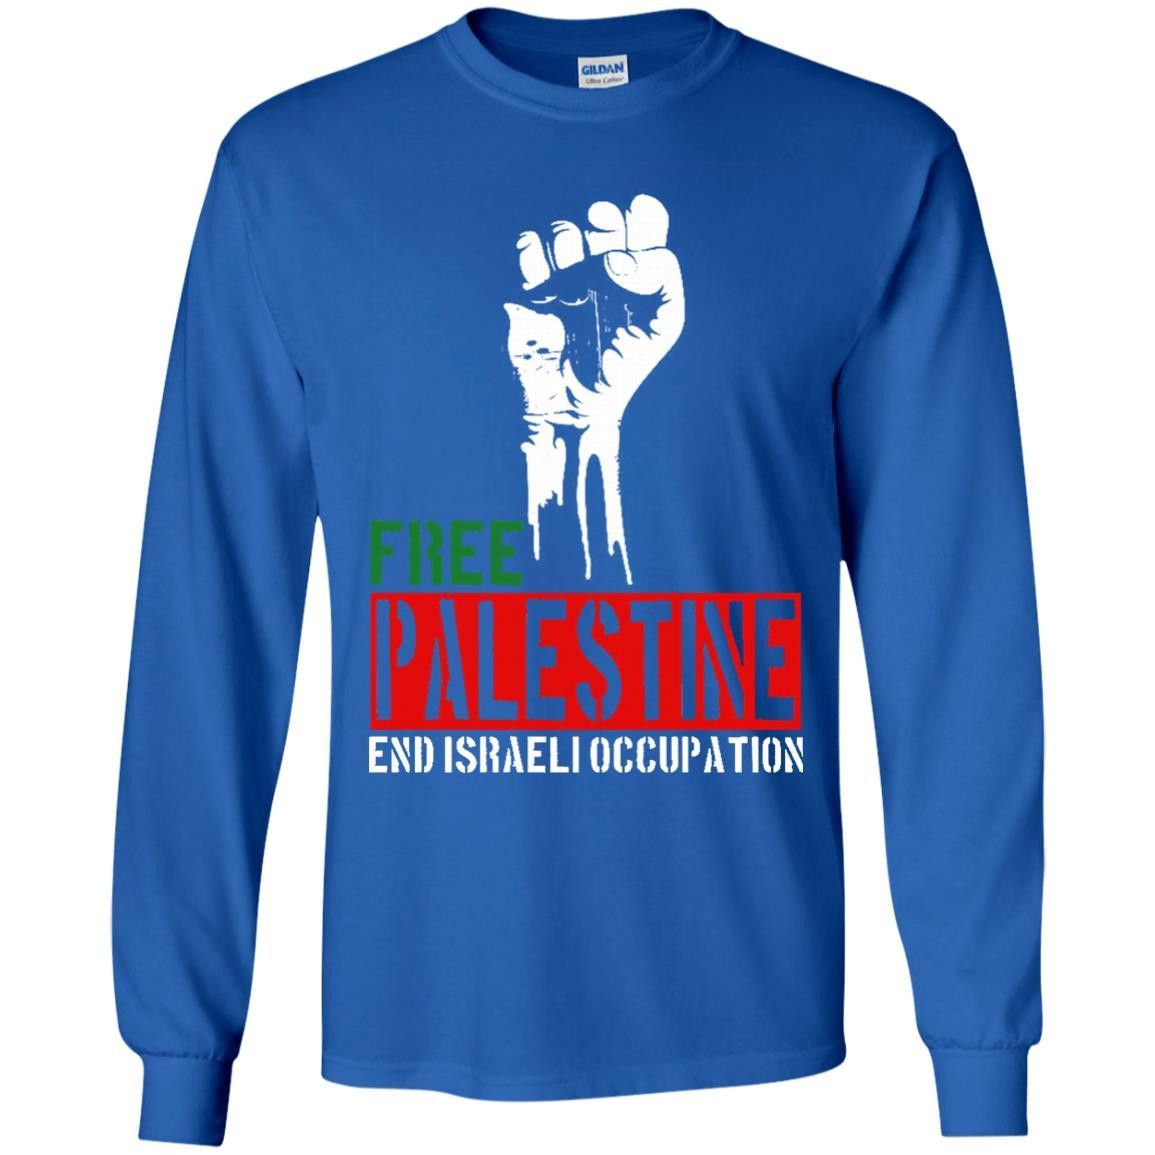 free palestine end israeli occupation G240 Gildan LS Ultra Cotton T-Shirt